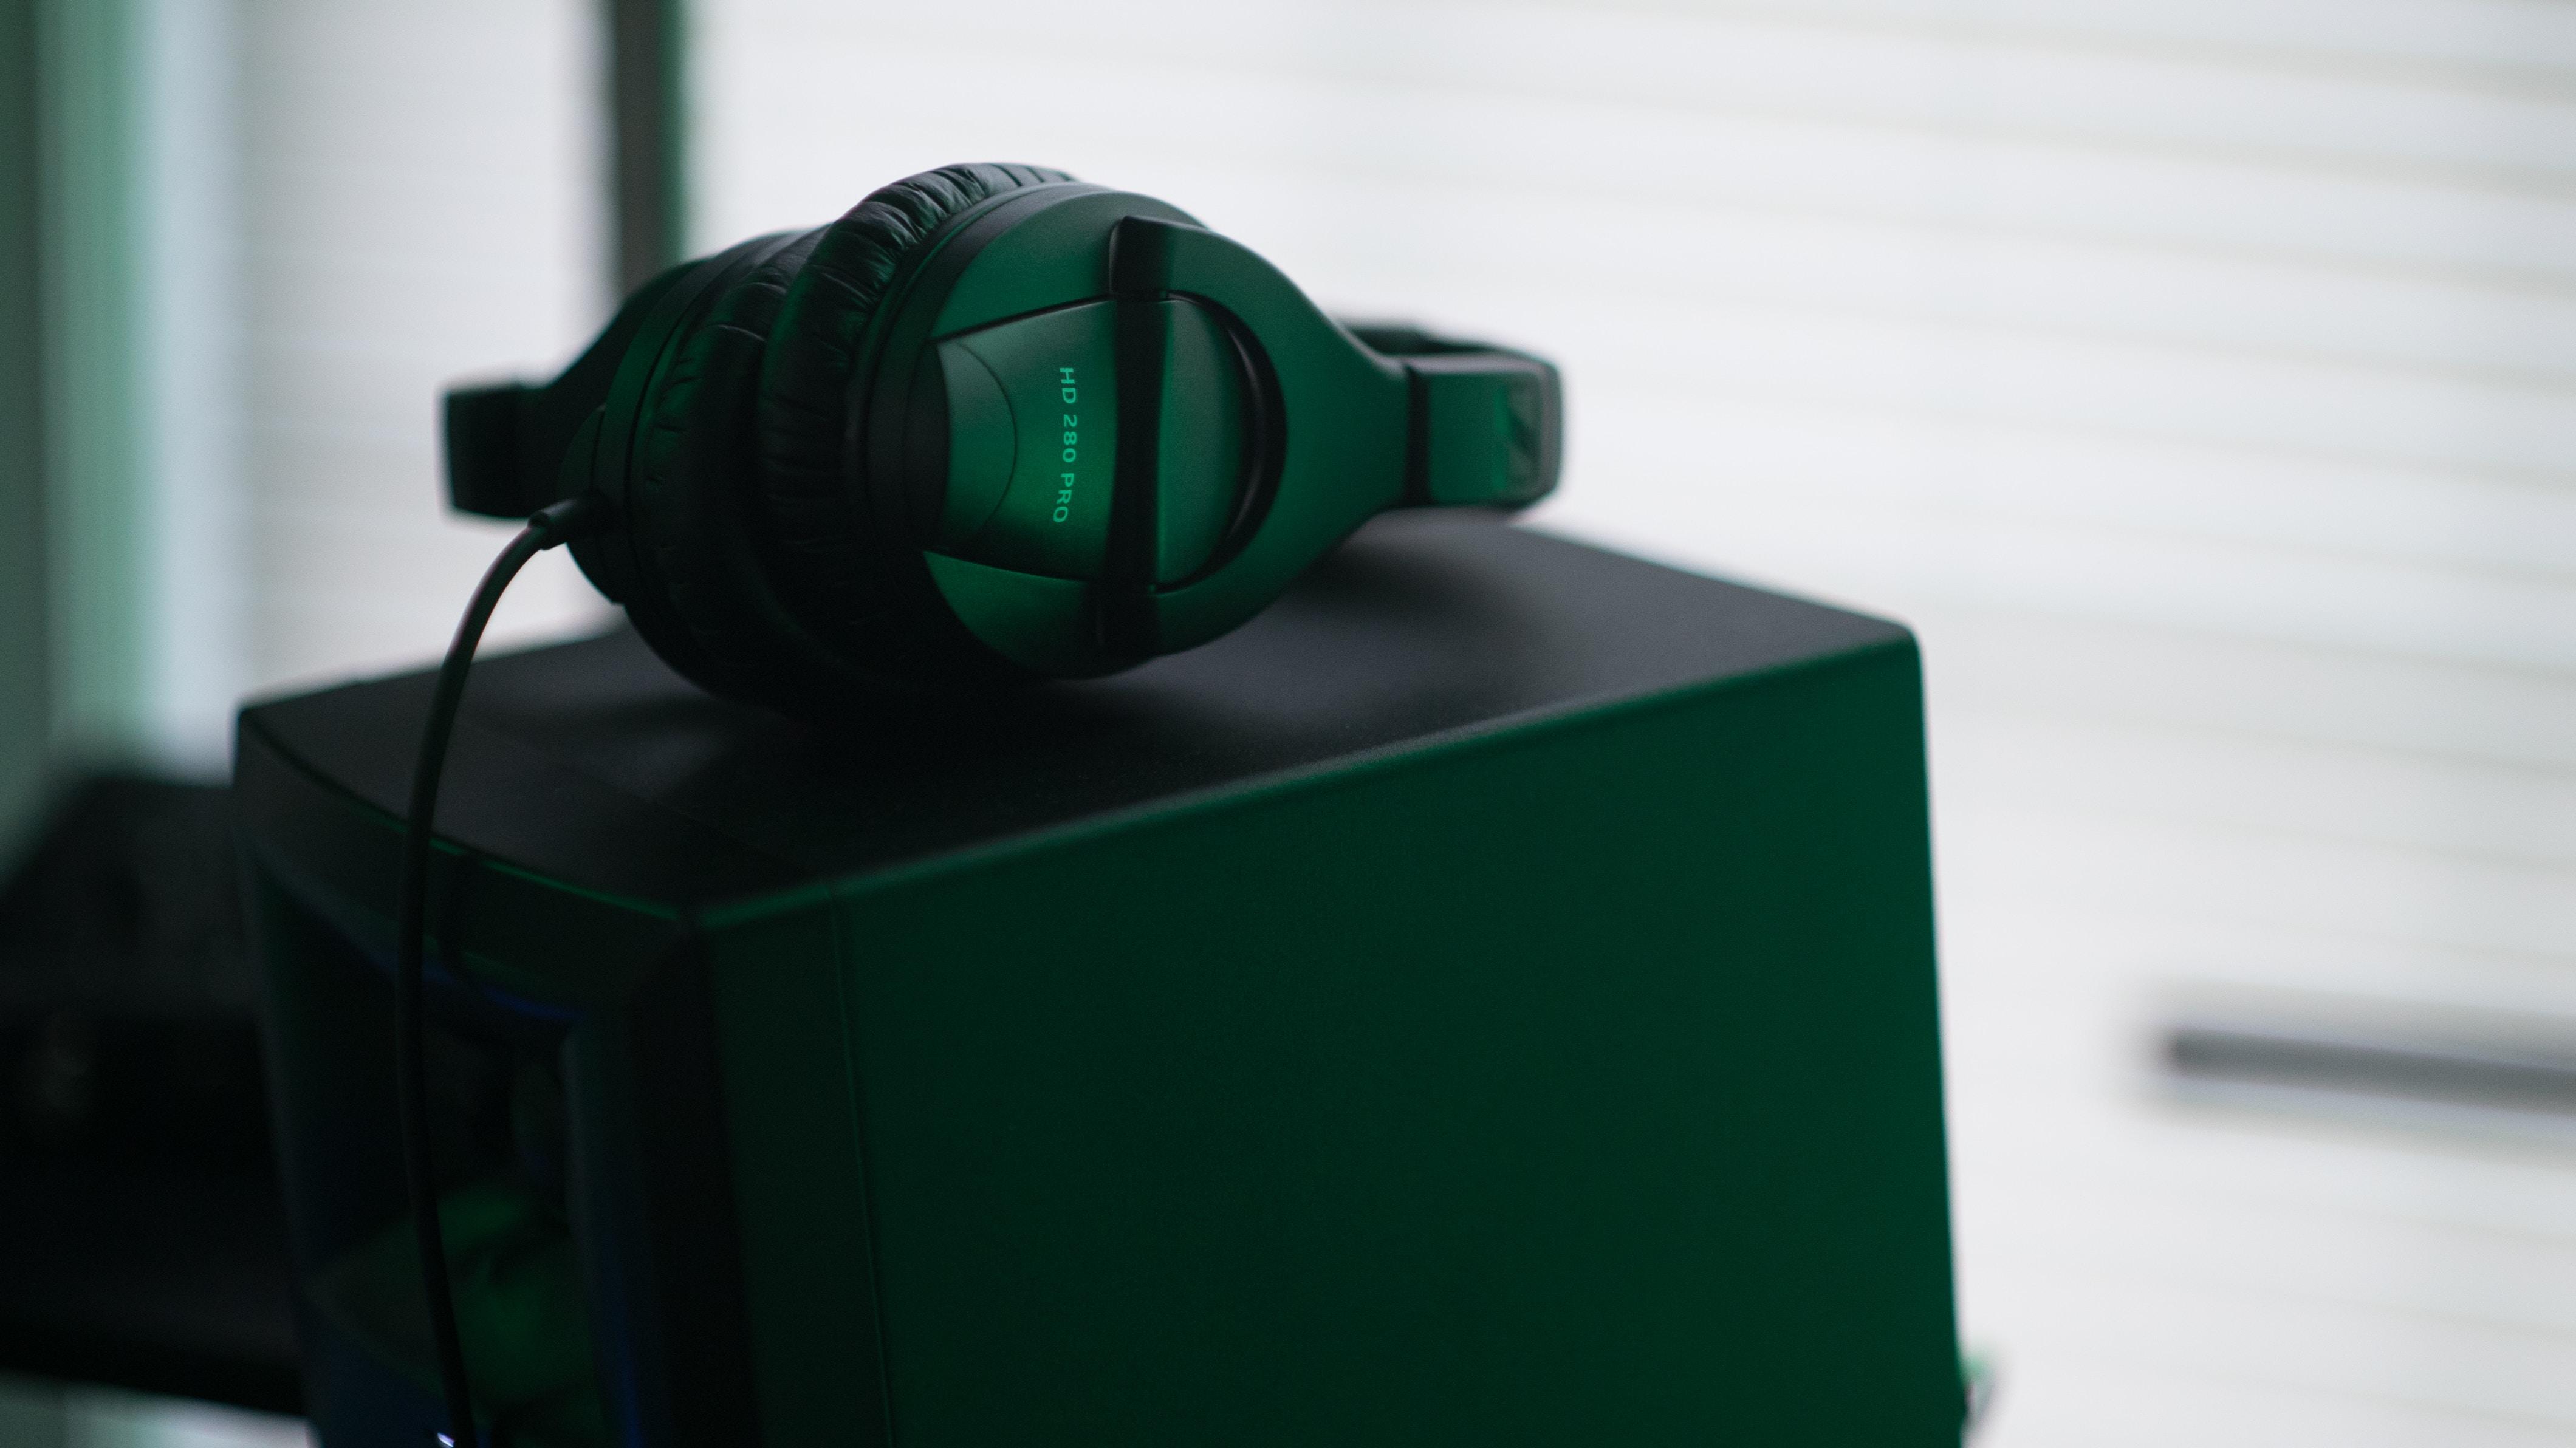 black headphones above black box